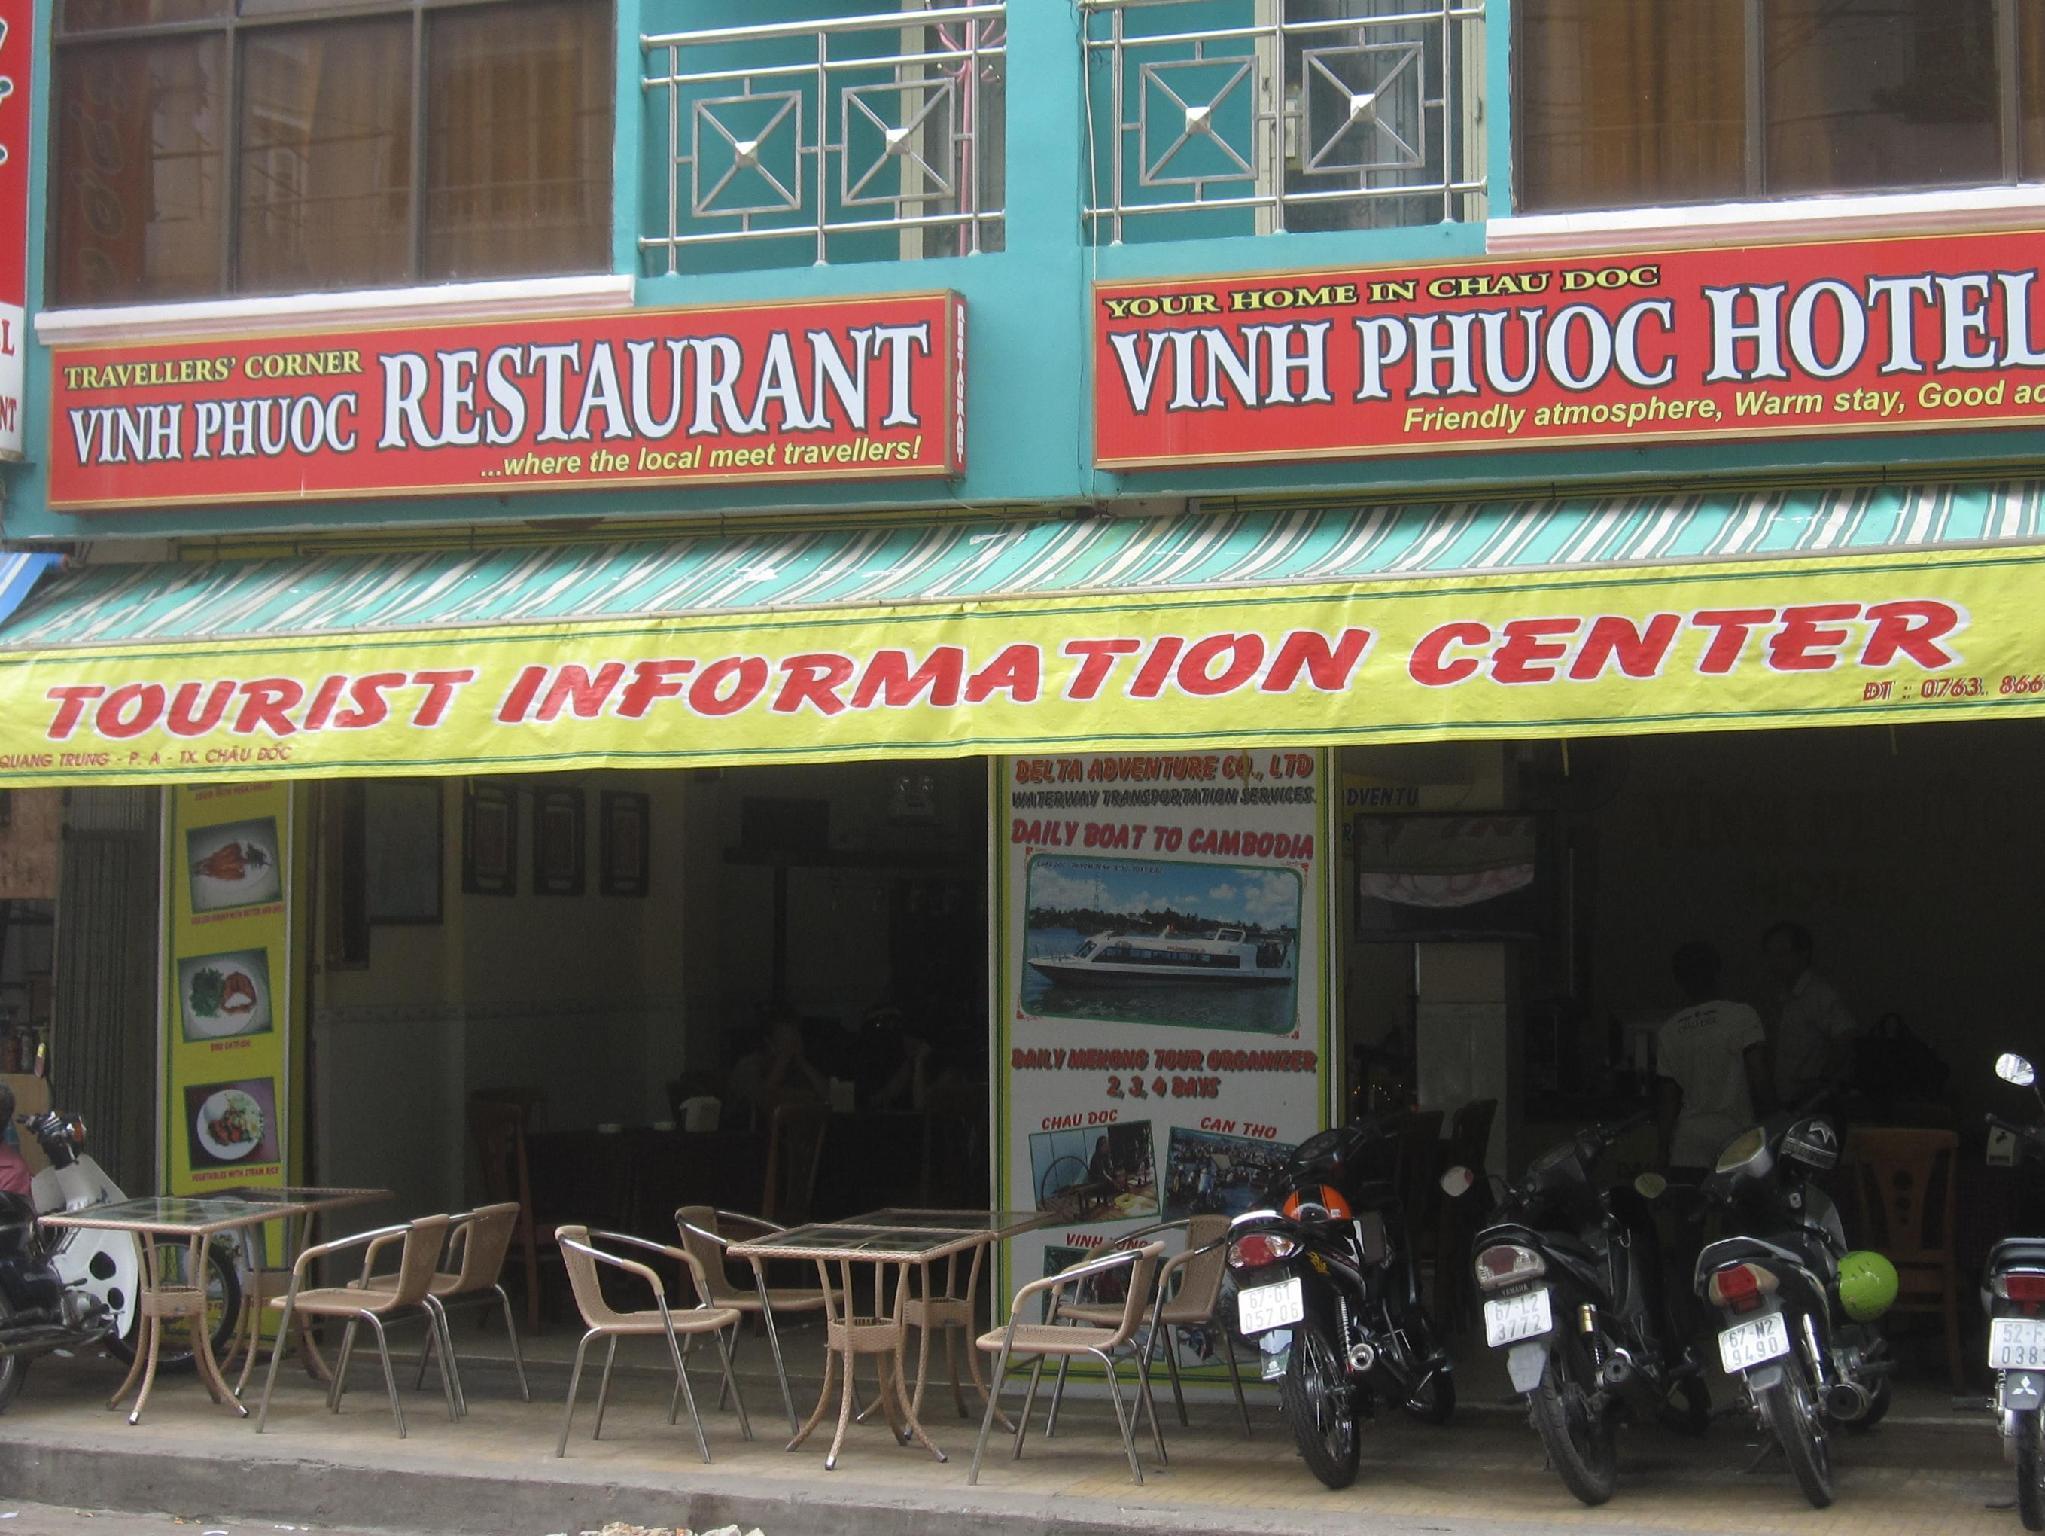 Vinh Phuoc Hotel - Hotell och Boende i Vietnam , Chau Doc (An Giang)